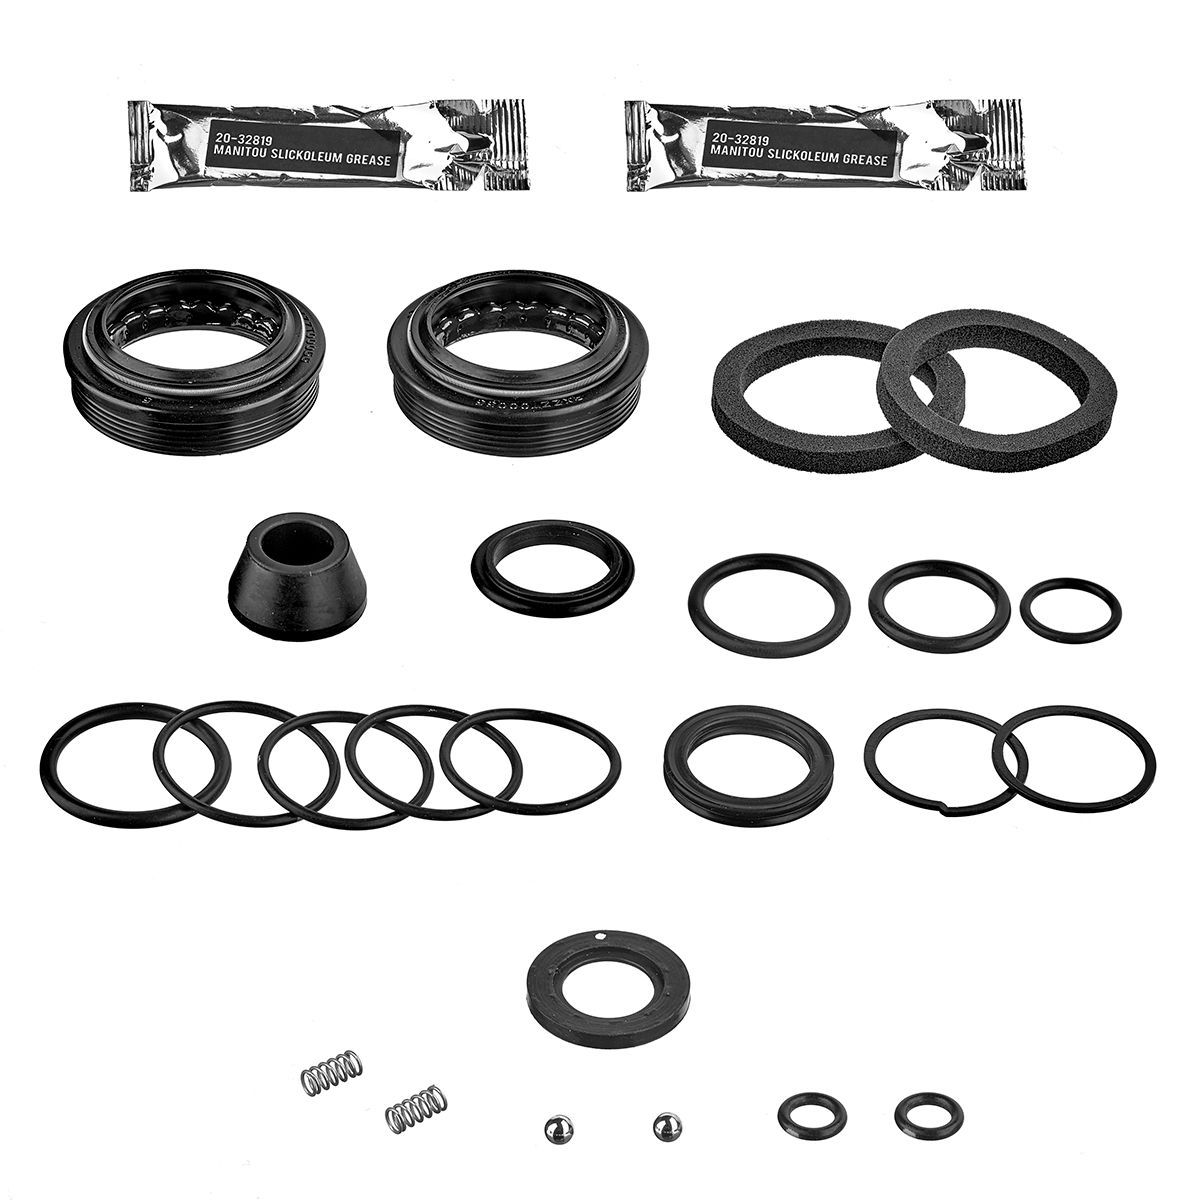 Kit De Reparo Para Manitou R7/M30 Completo 141-28528-K004